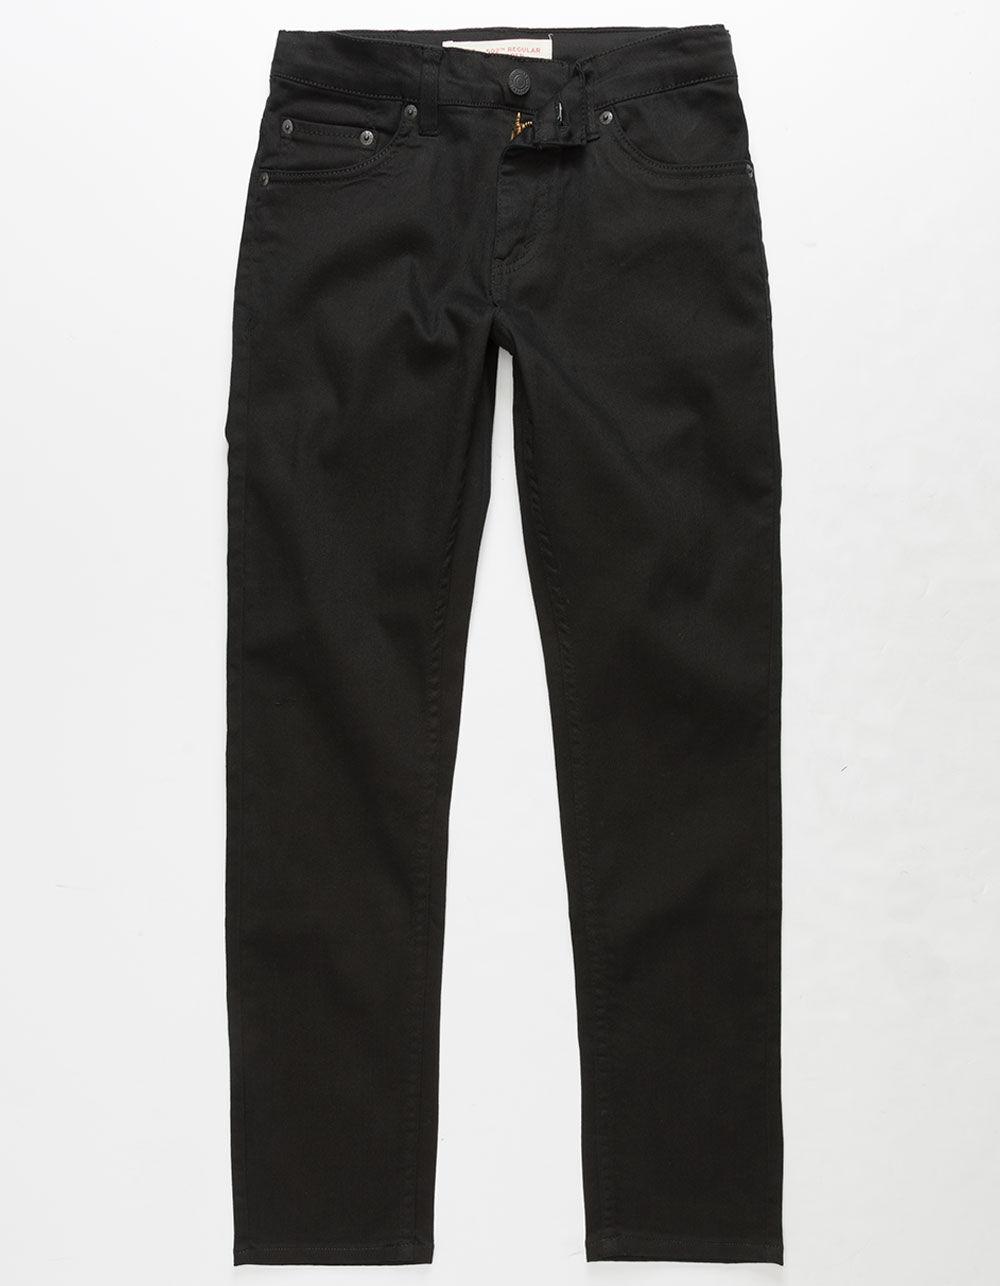 LEVI'S 502 Regular Taper Fit Black Boys Jeans